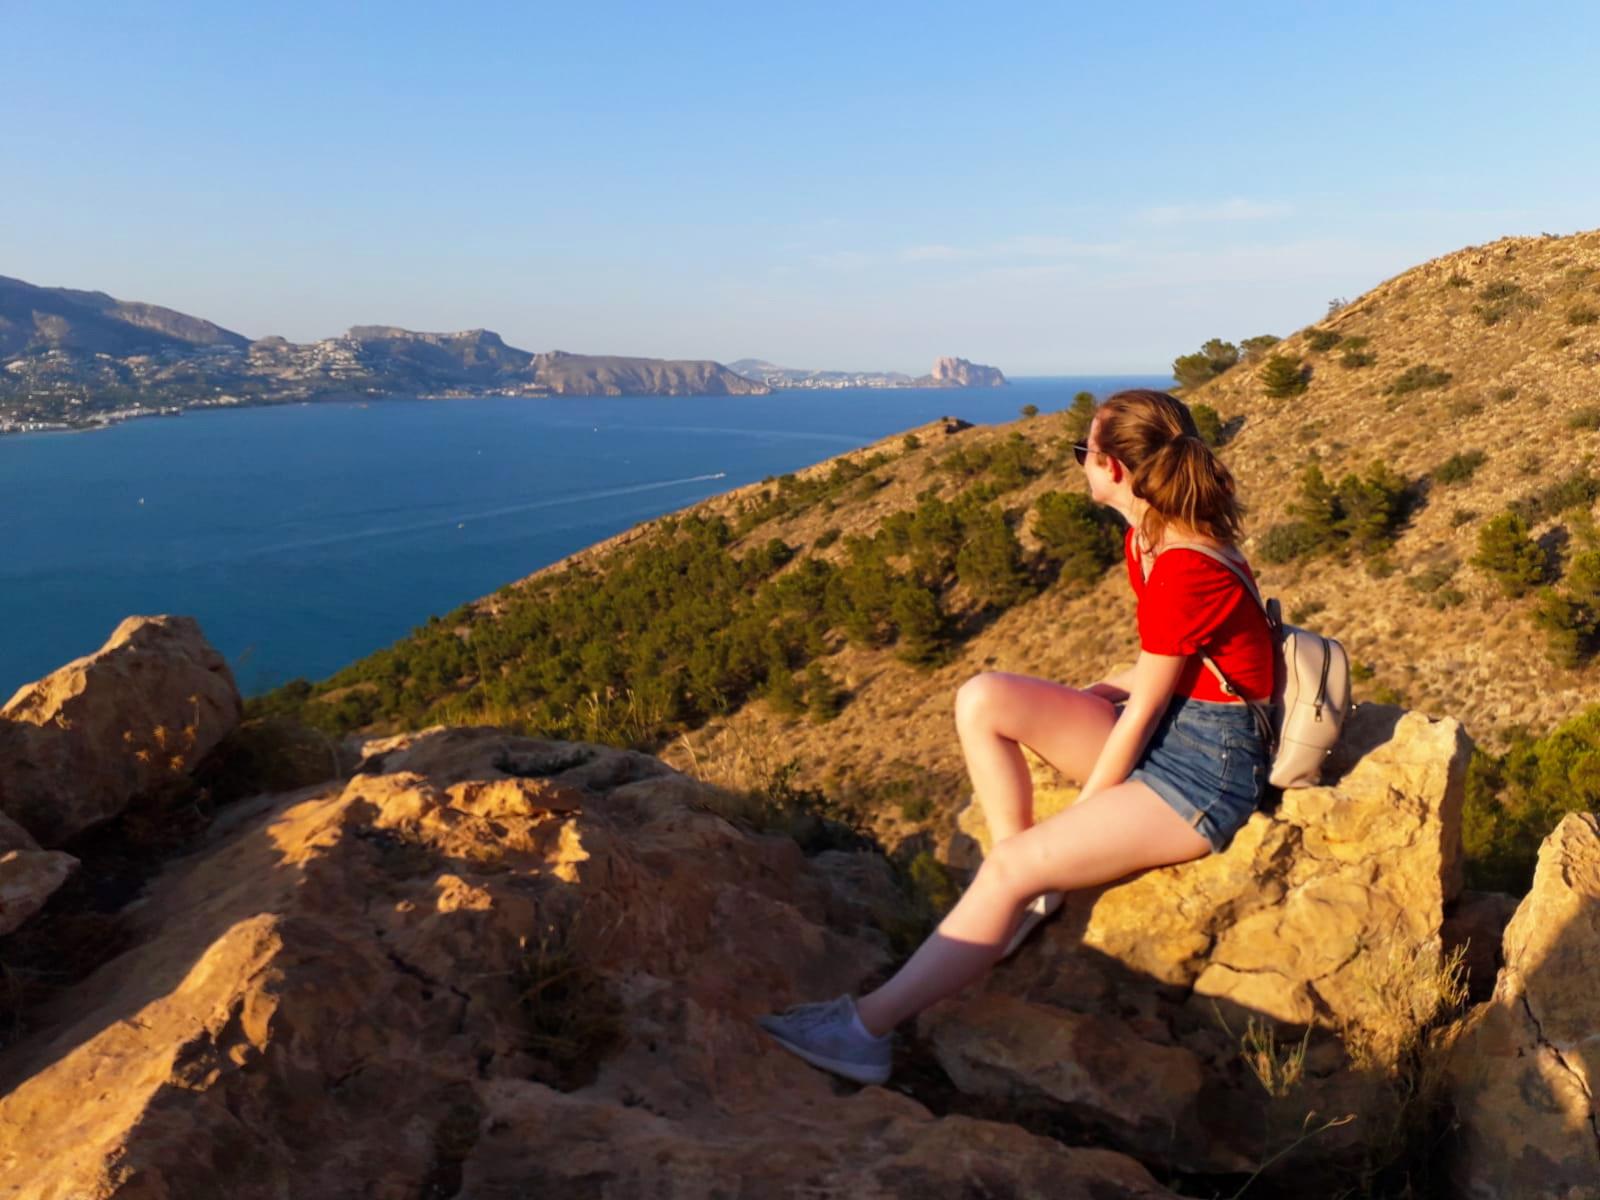 Juice boost detox weekend from la Crisalida virtual retreats